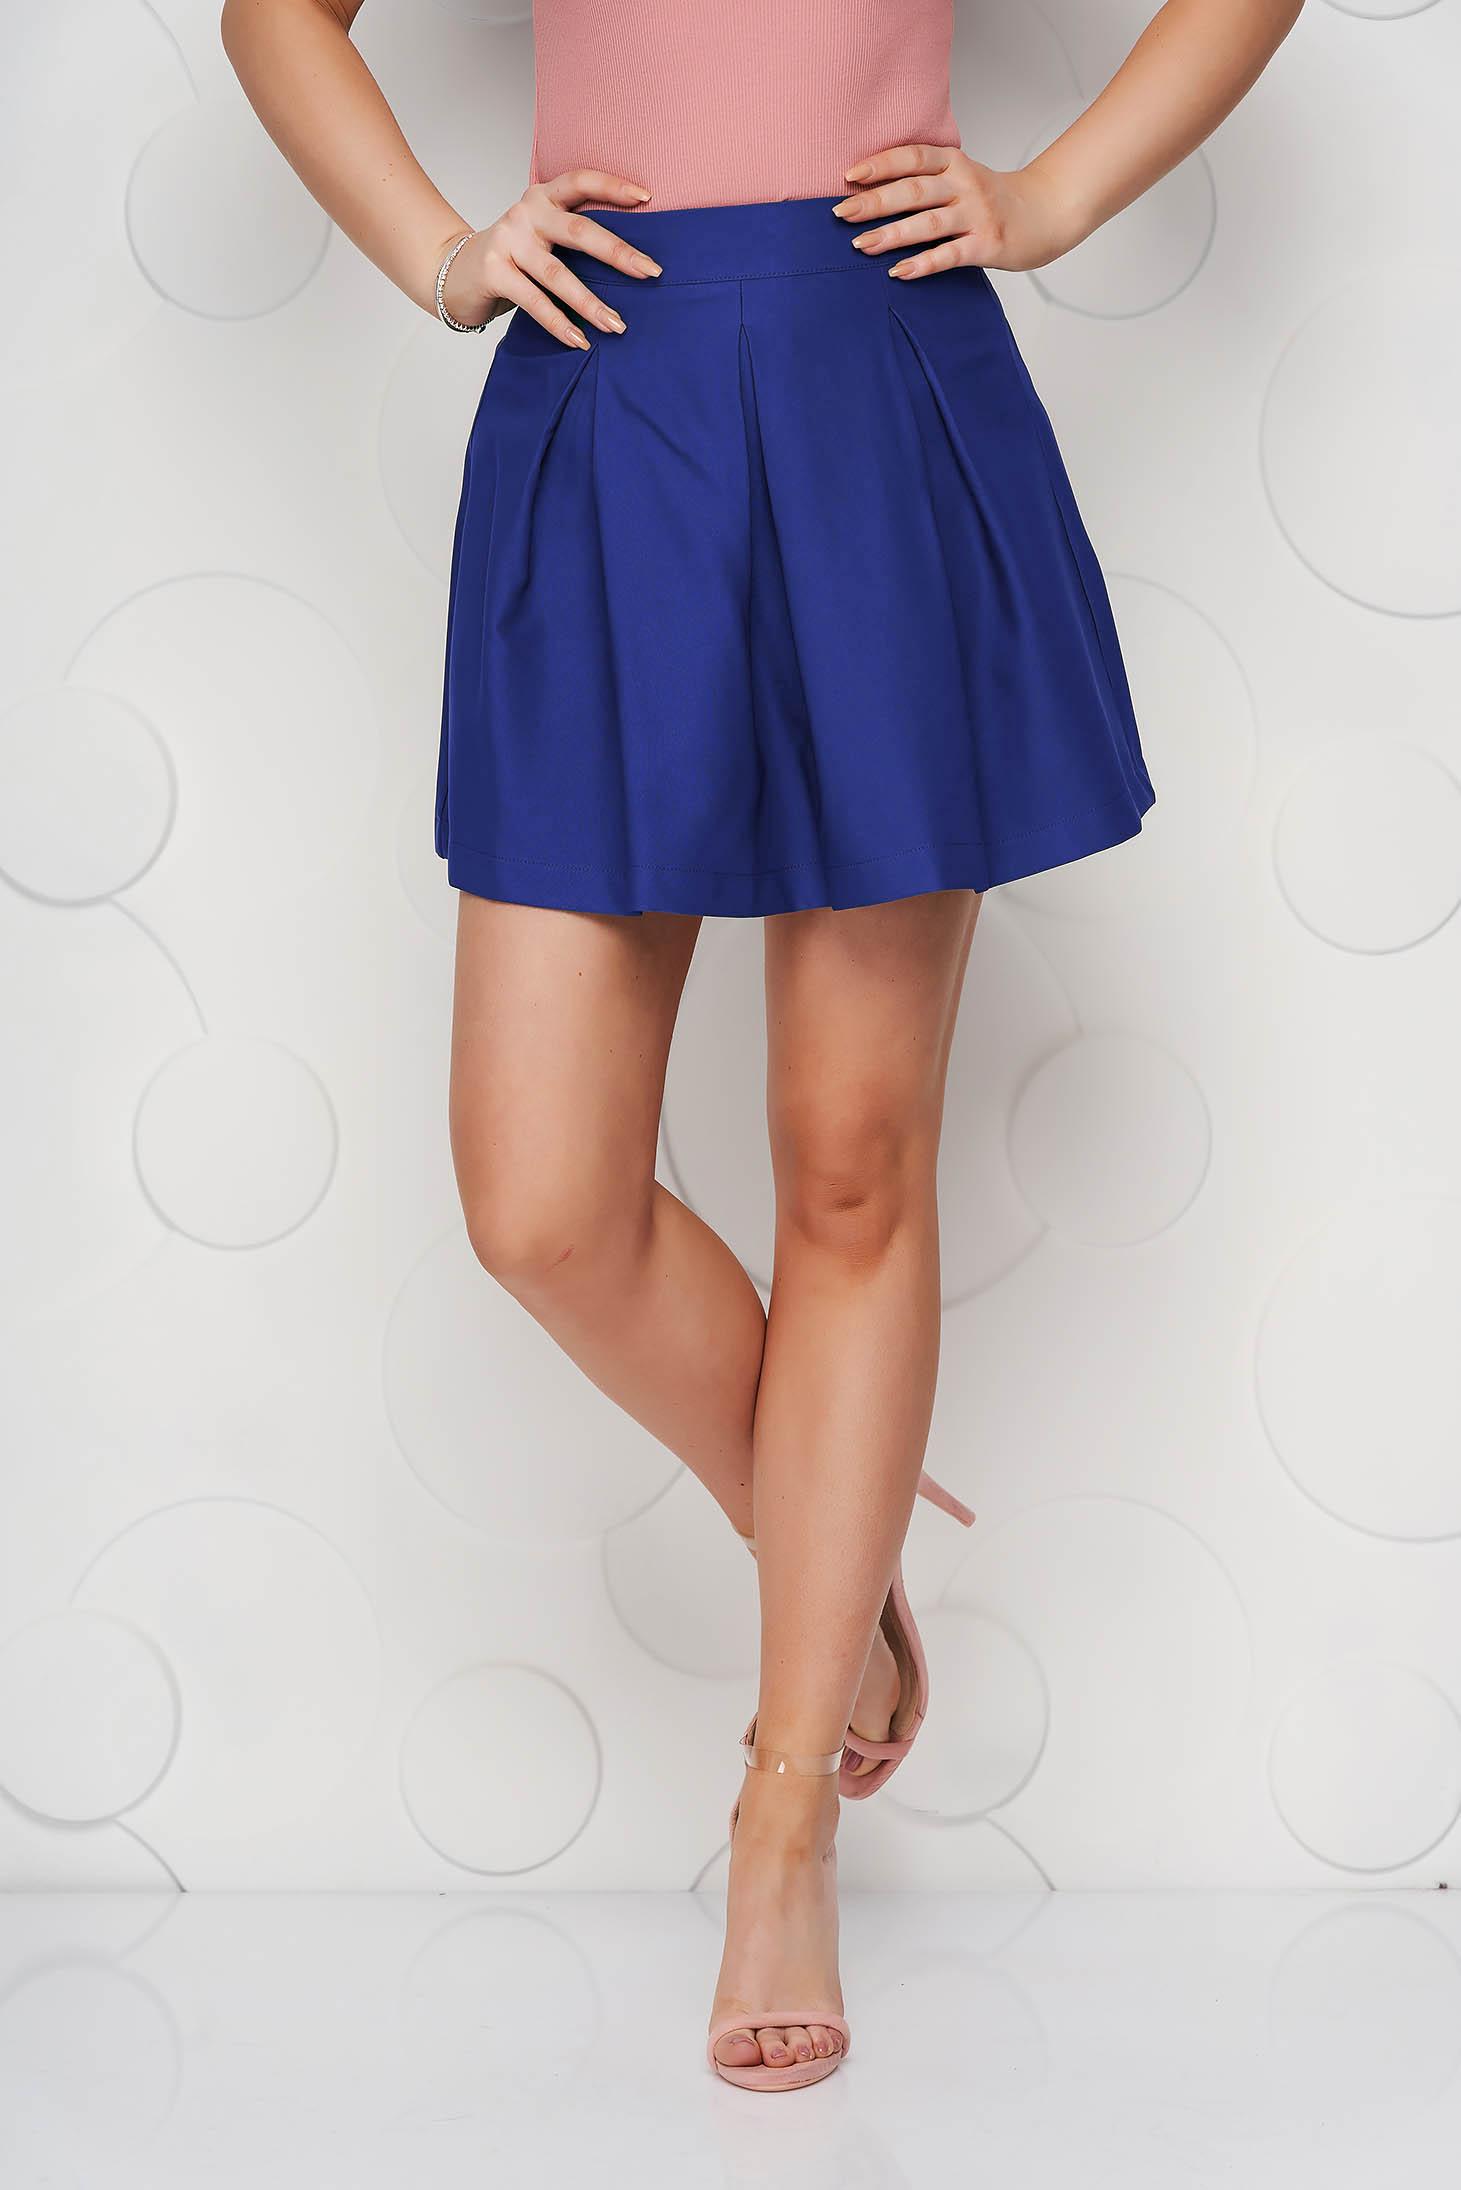 Fusta Artista albastra casual in clos cu talie normala din material usor elastic